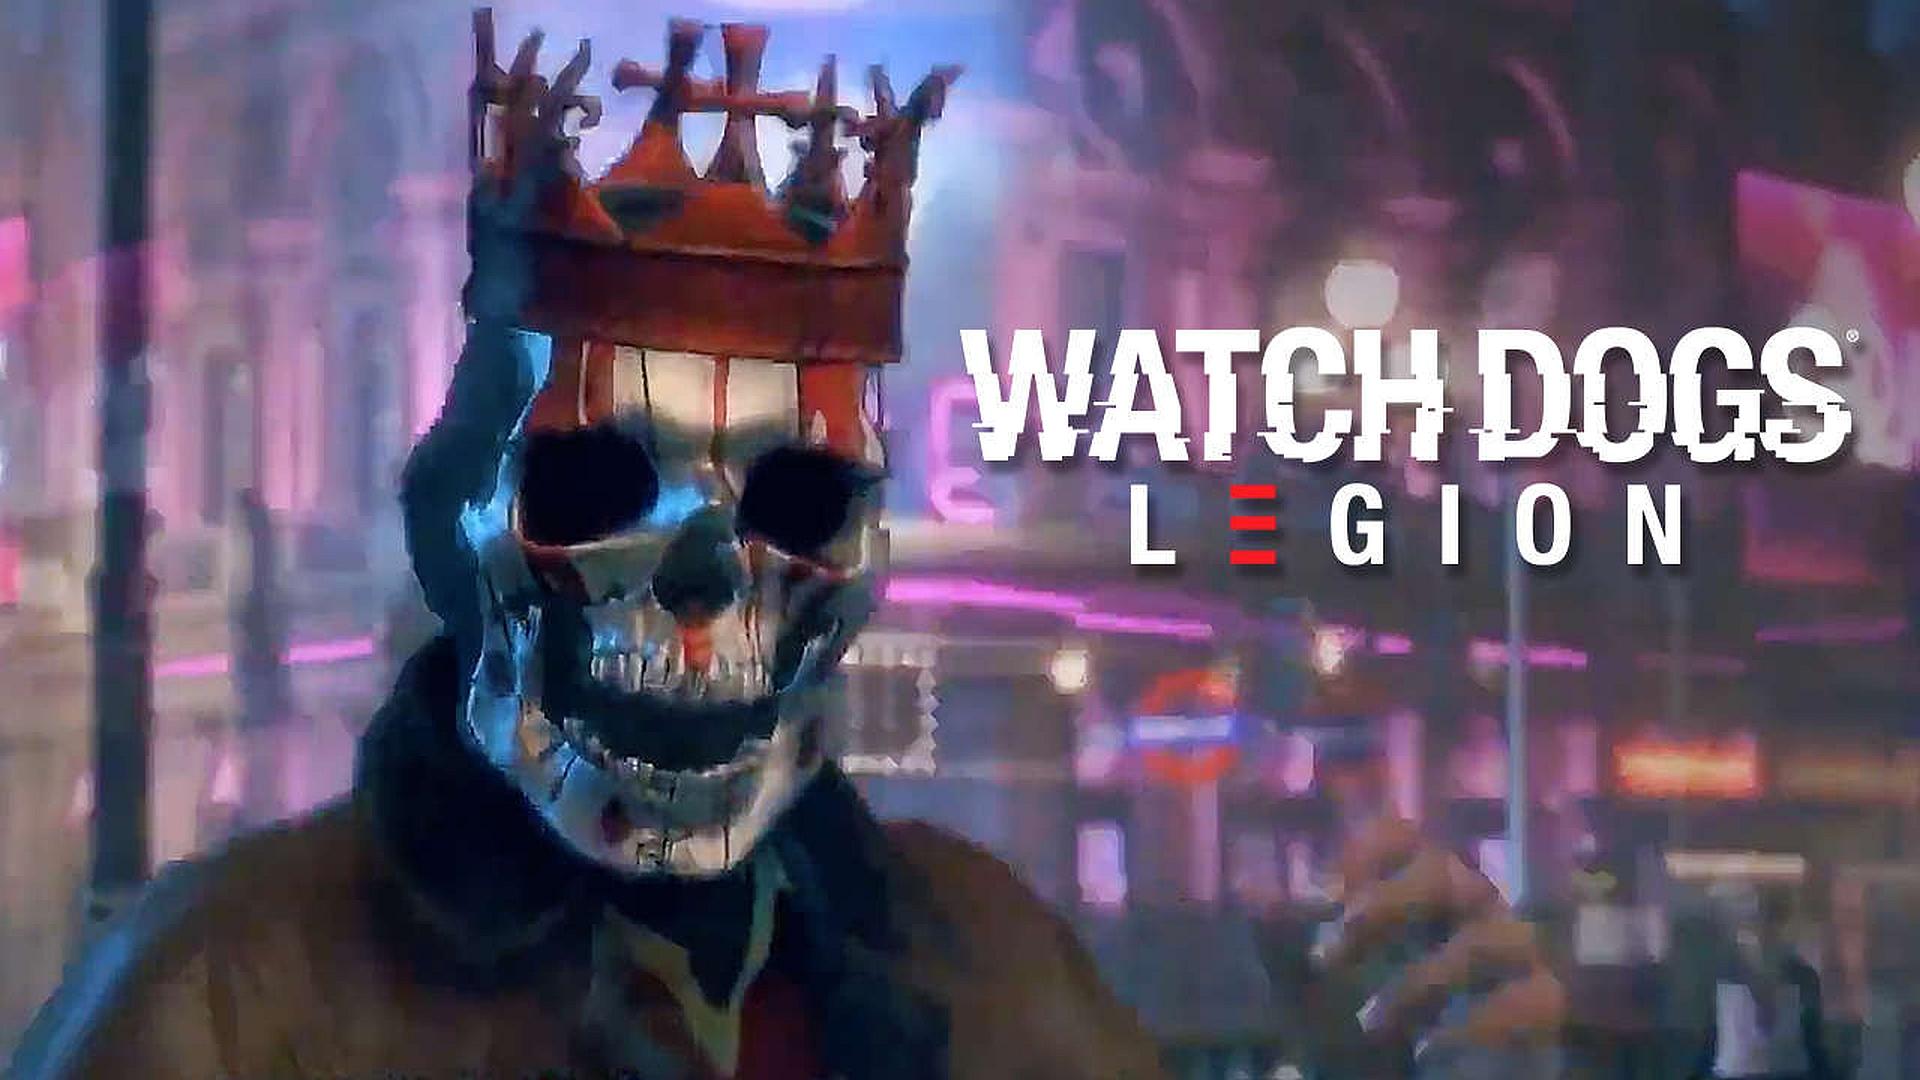 Stadia Connect | تریلری جدید از Watch Dogs: Legion منتشر شد